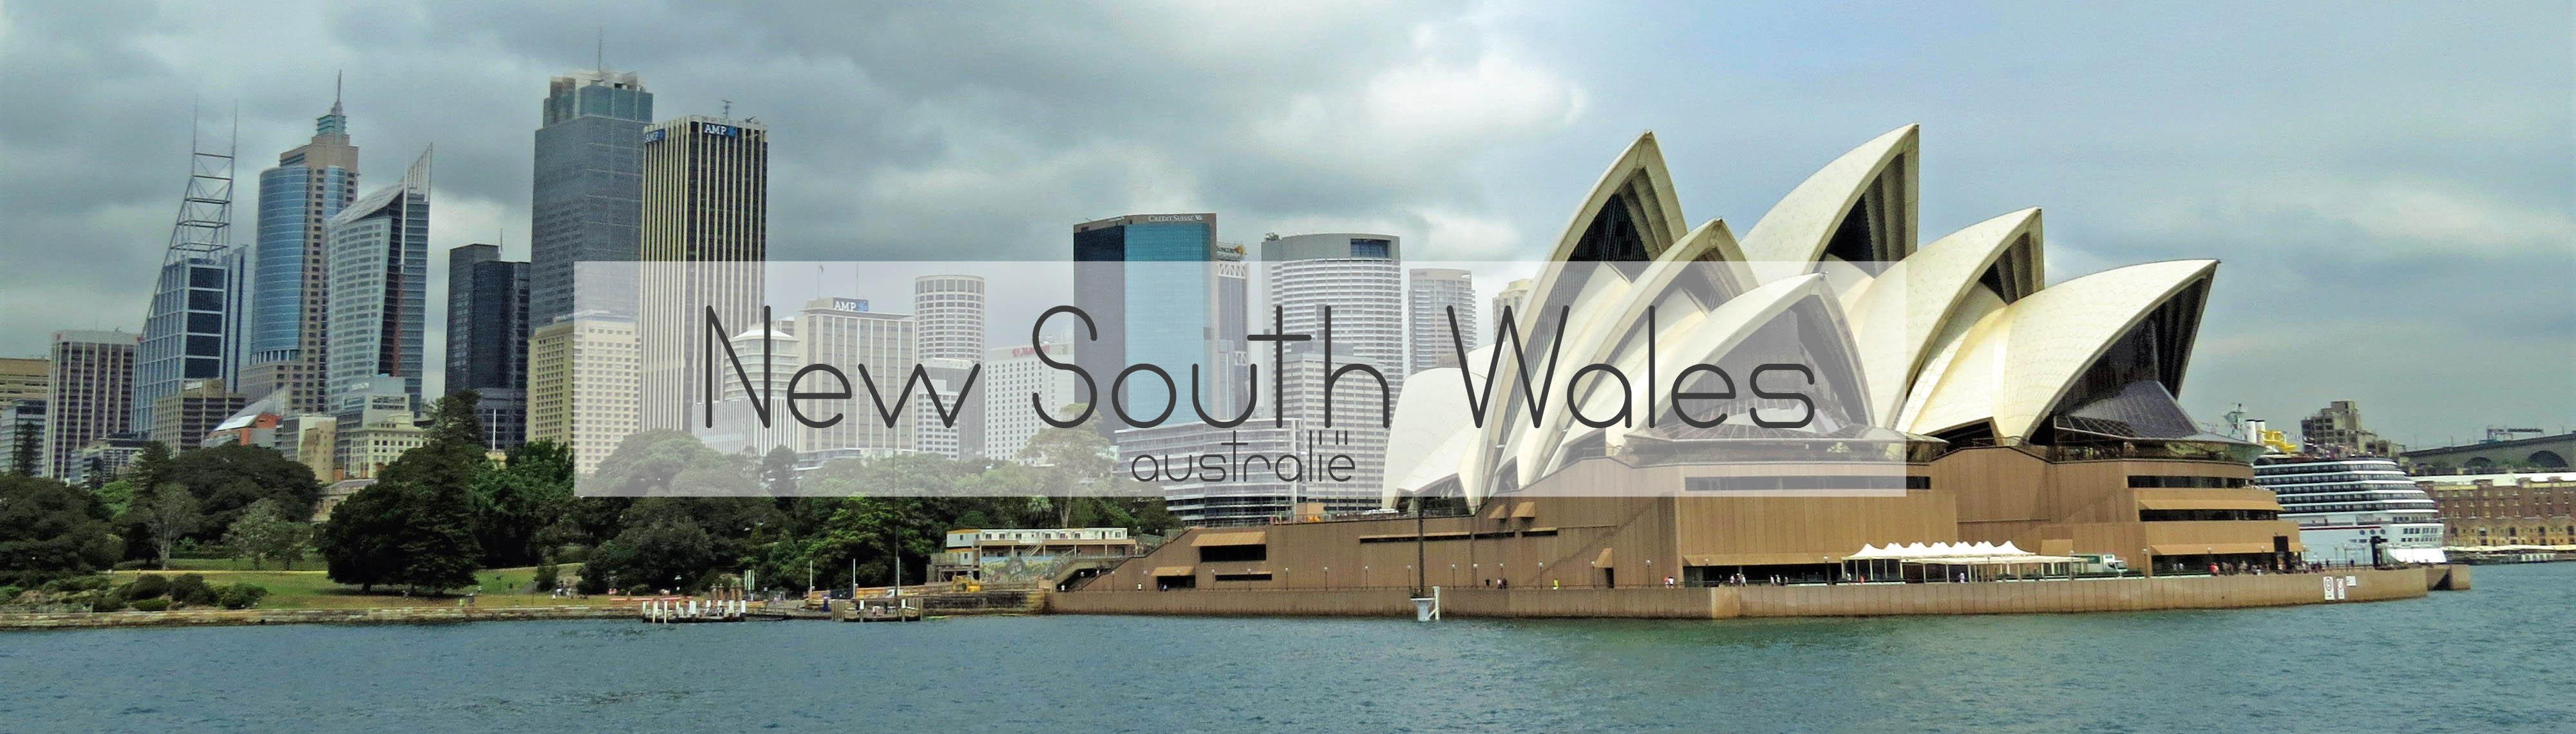 new-south-wales-header